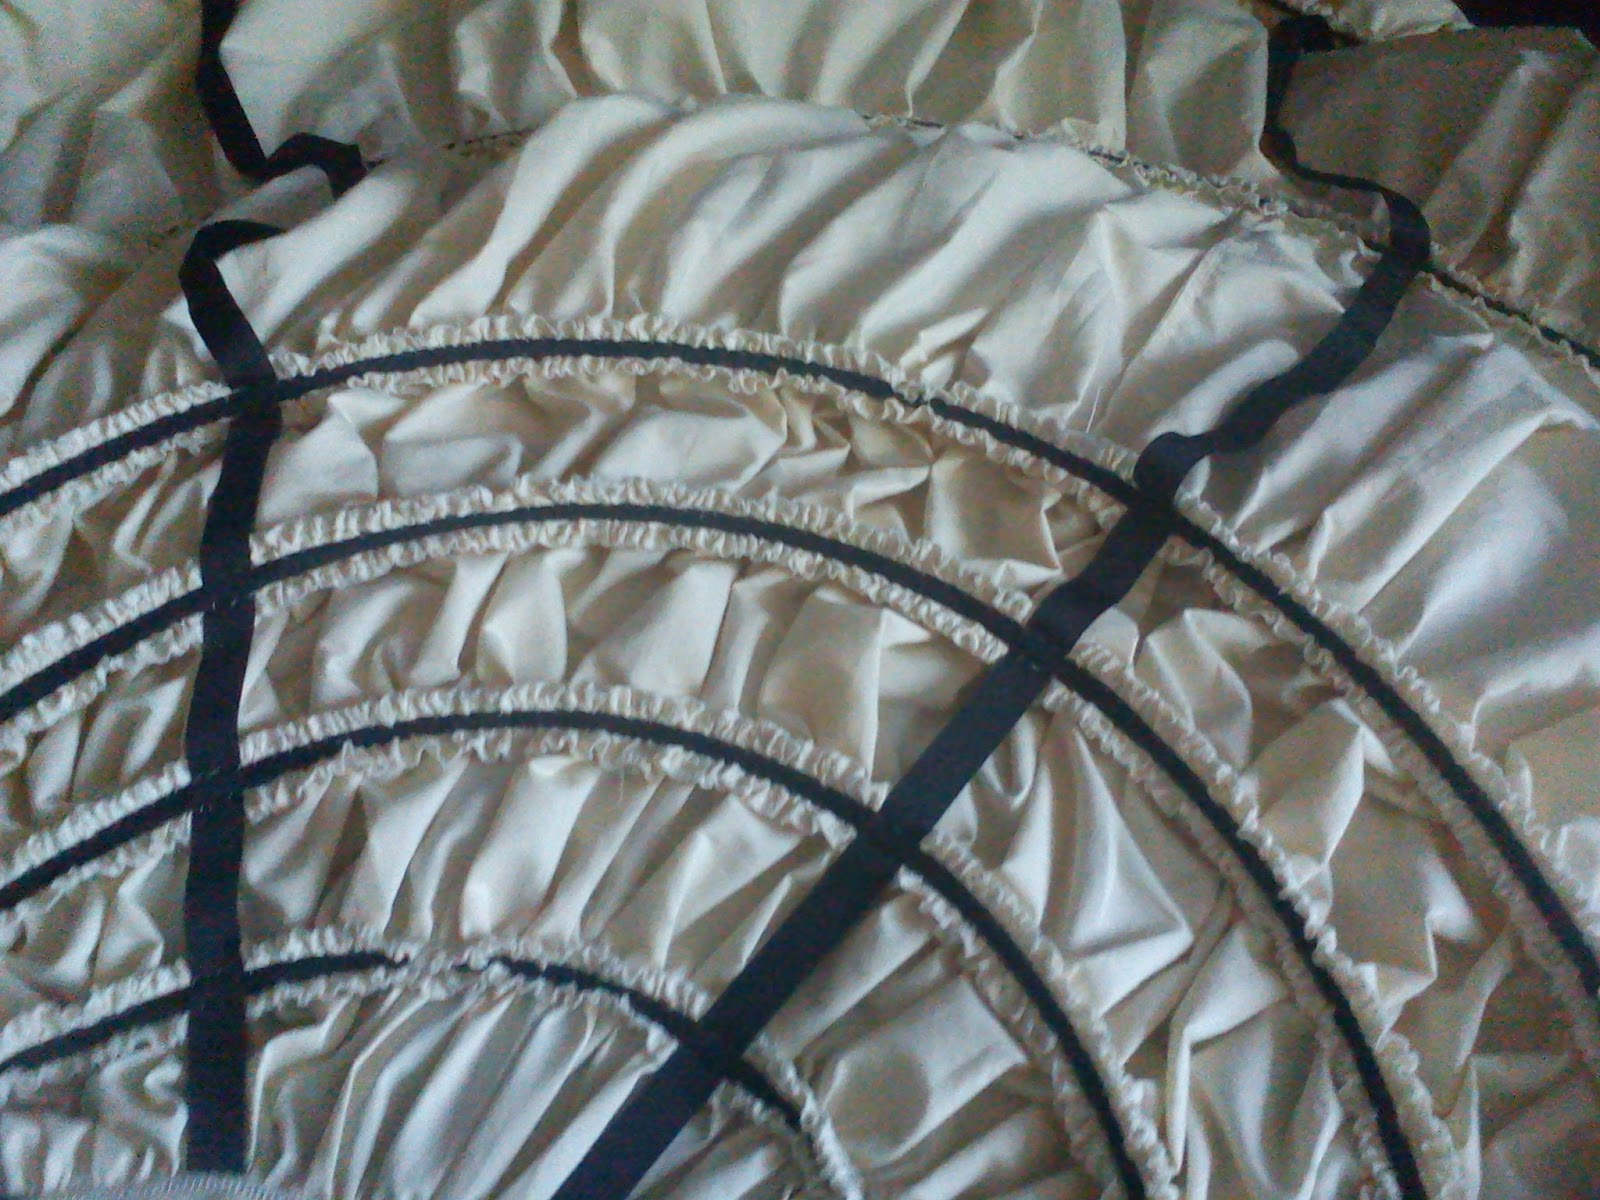 fliegende f chse anleitung gro er krinolinenreifrock um 1860. Black Bedroom Furniture Sets. Home Design Ideas